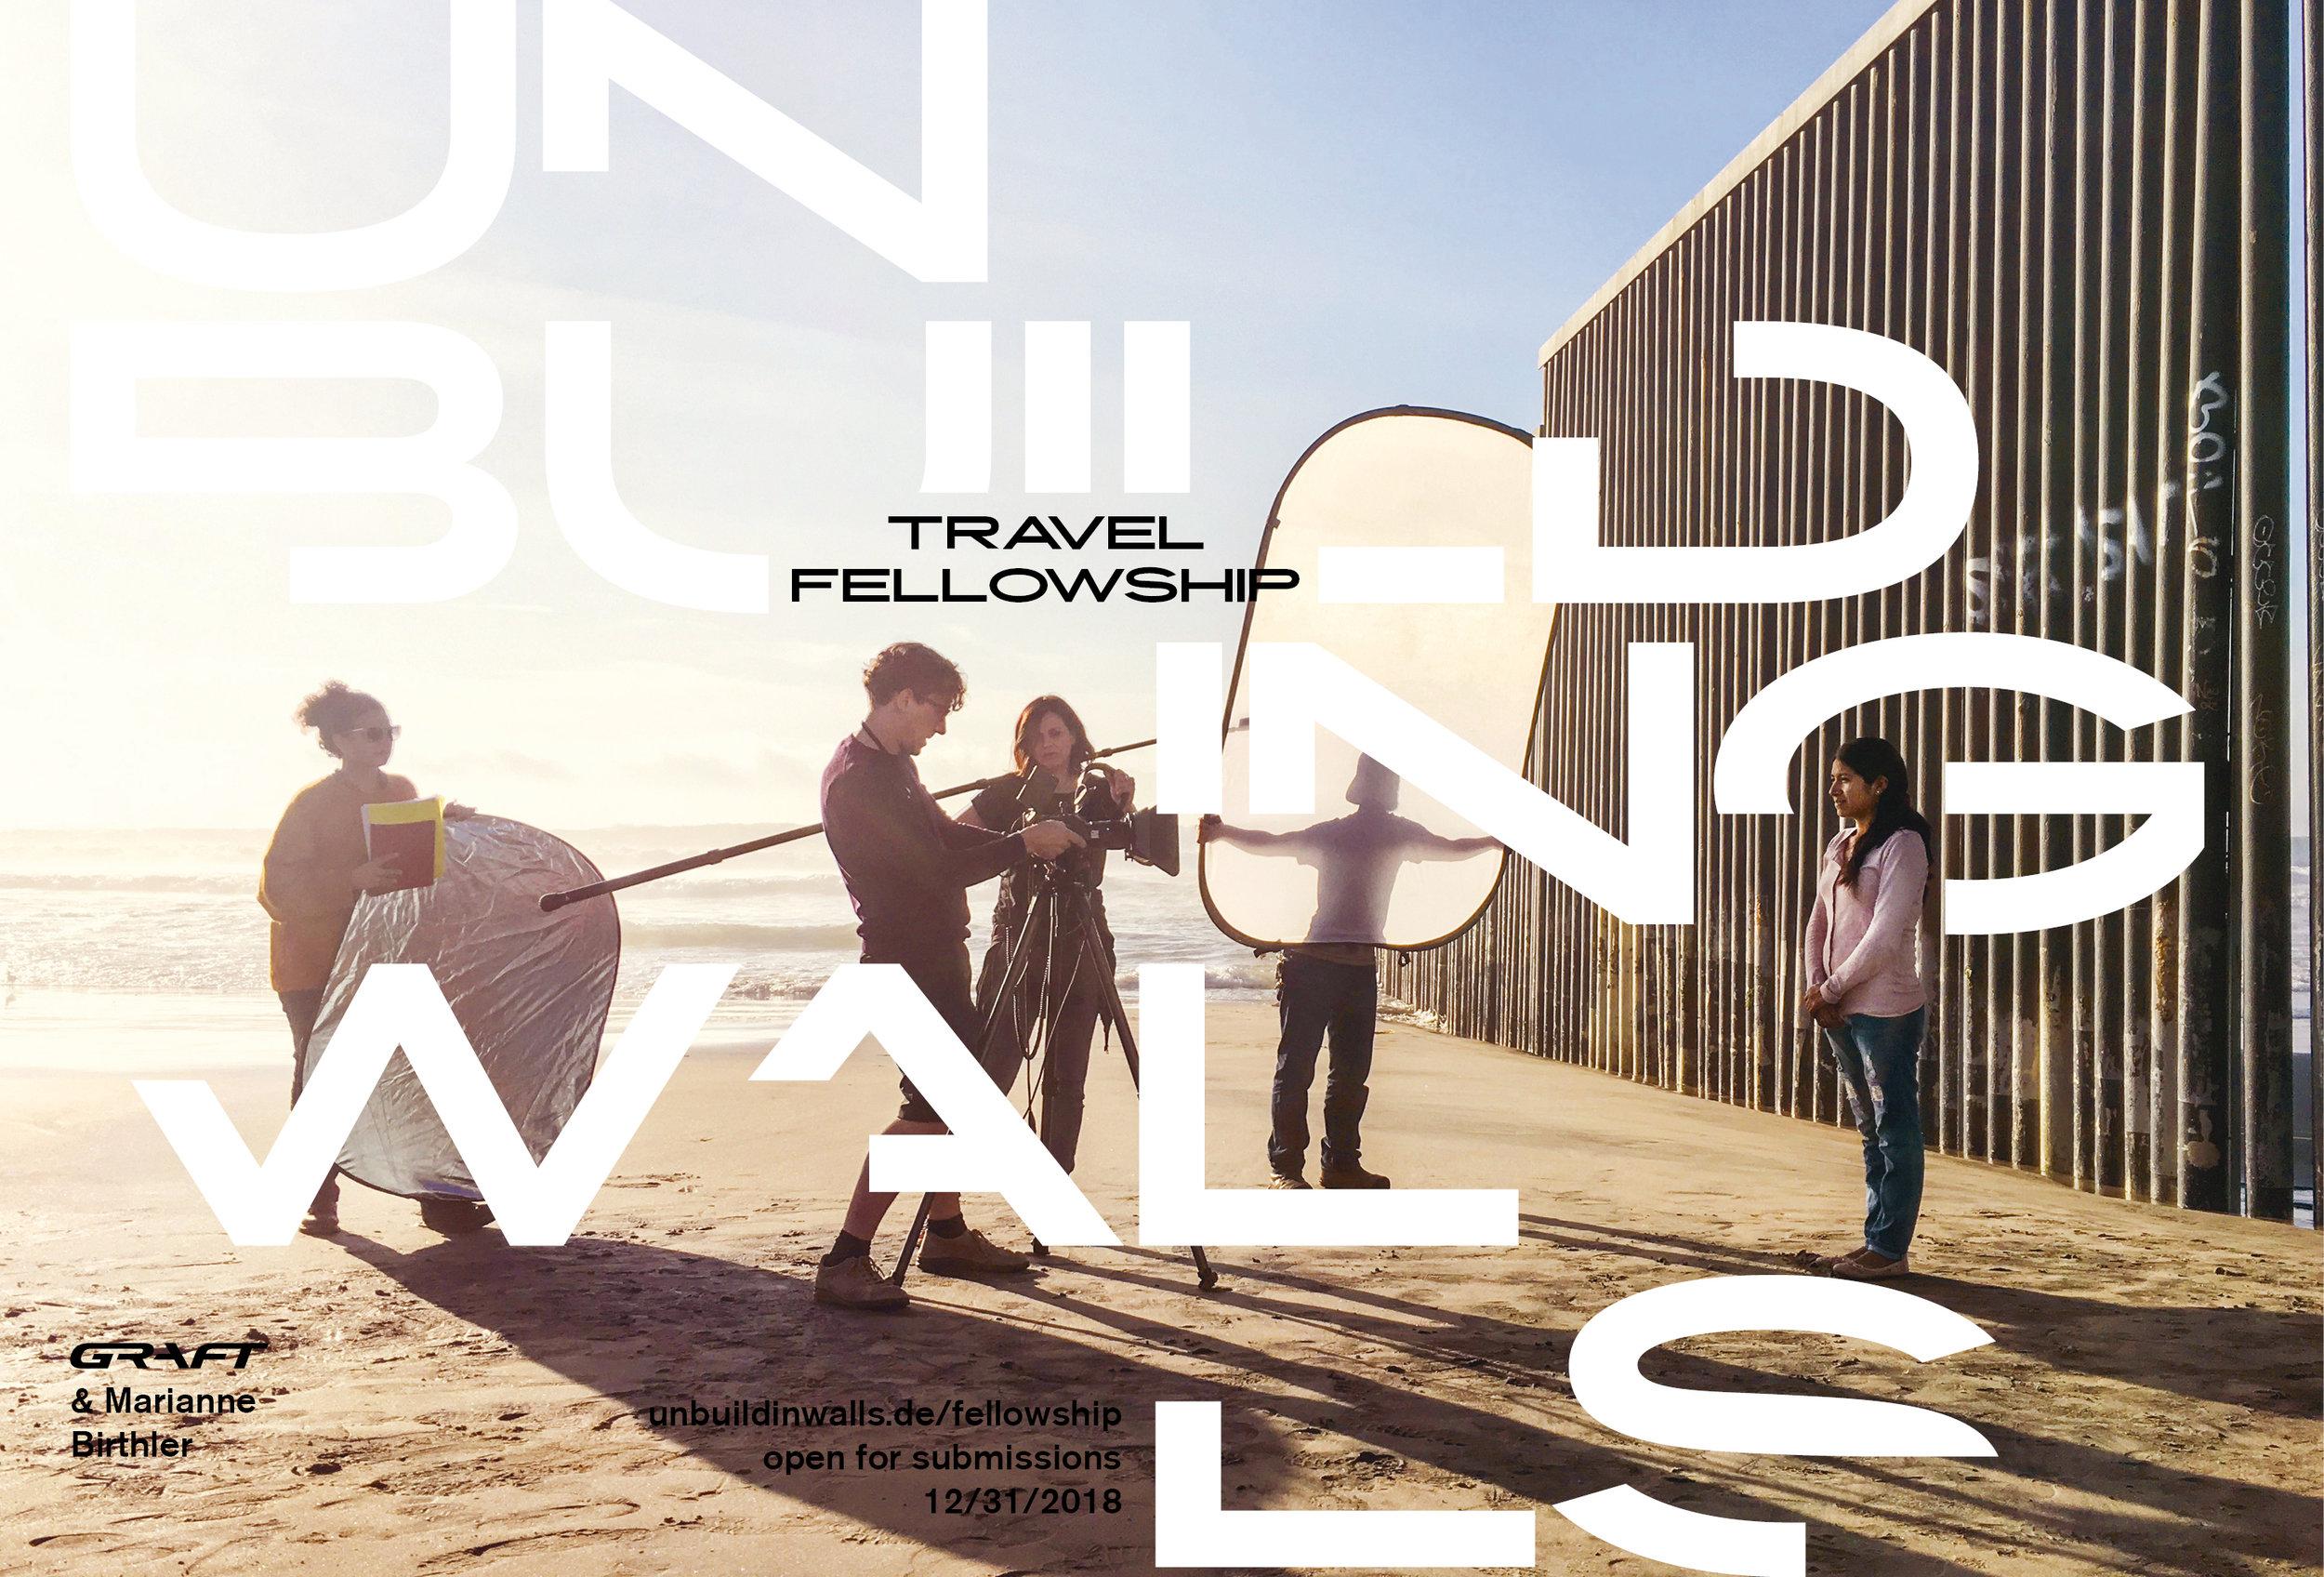 GRAFT_Unbuilding Walls Travel Fellowship(c)Viviana Catros